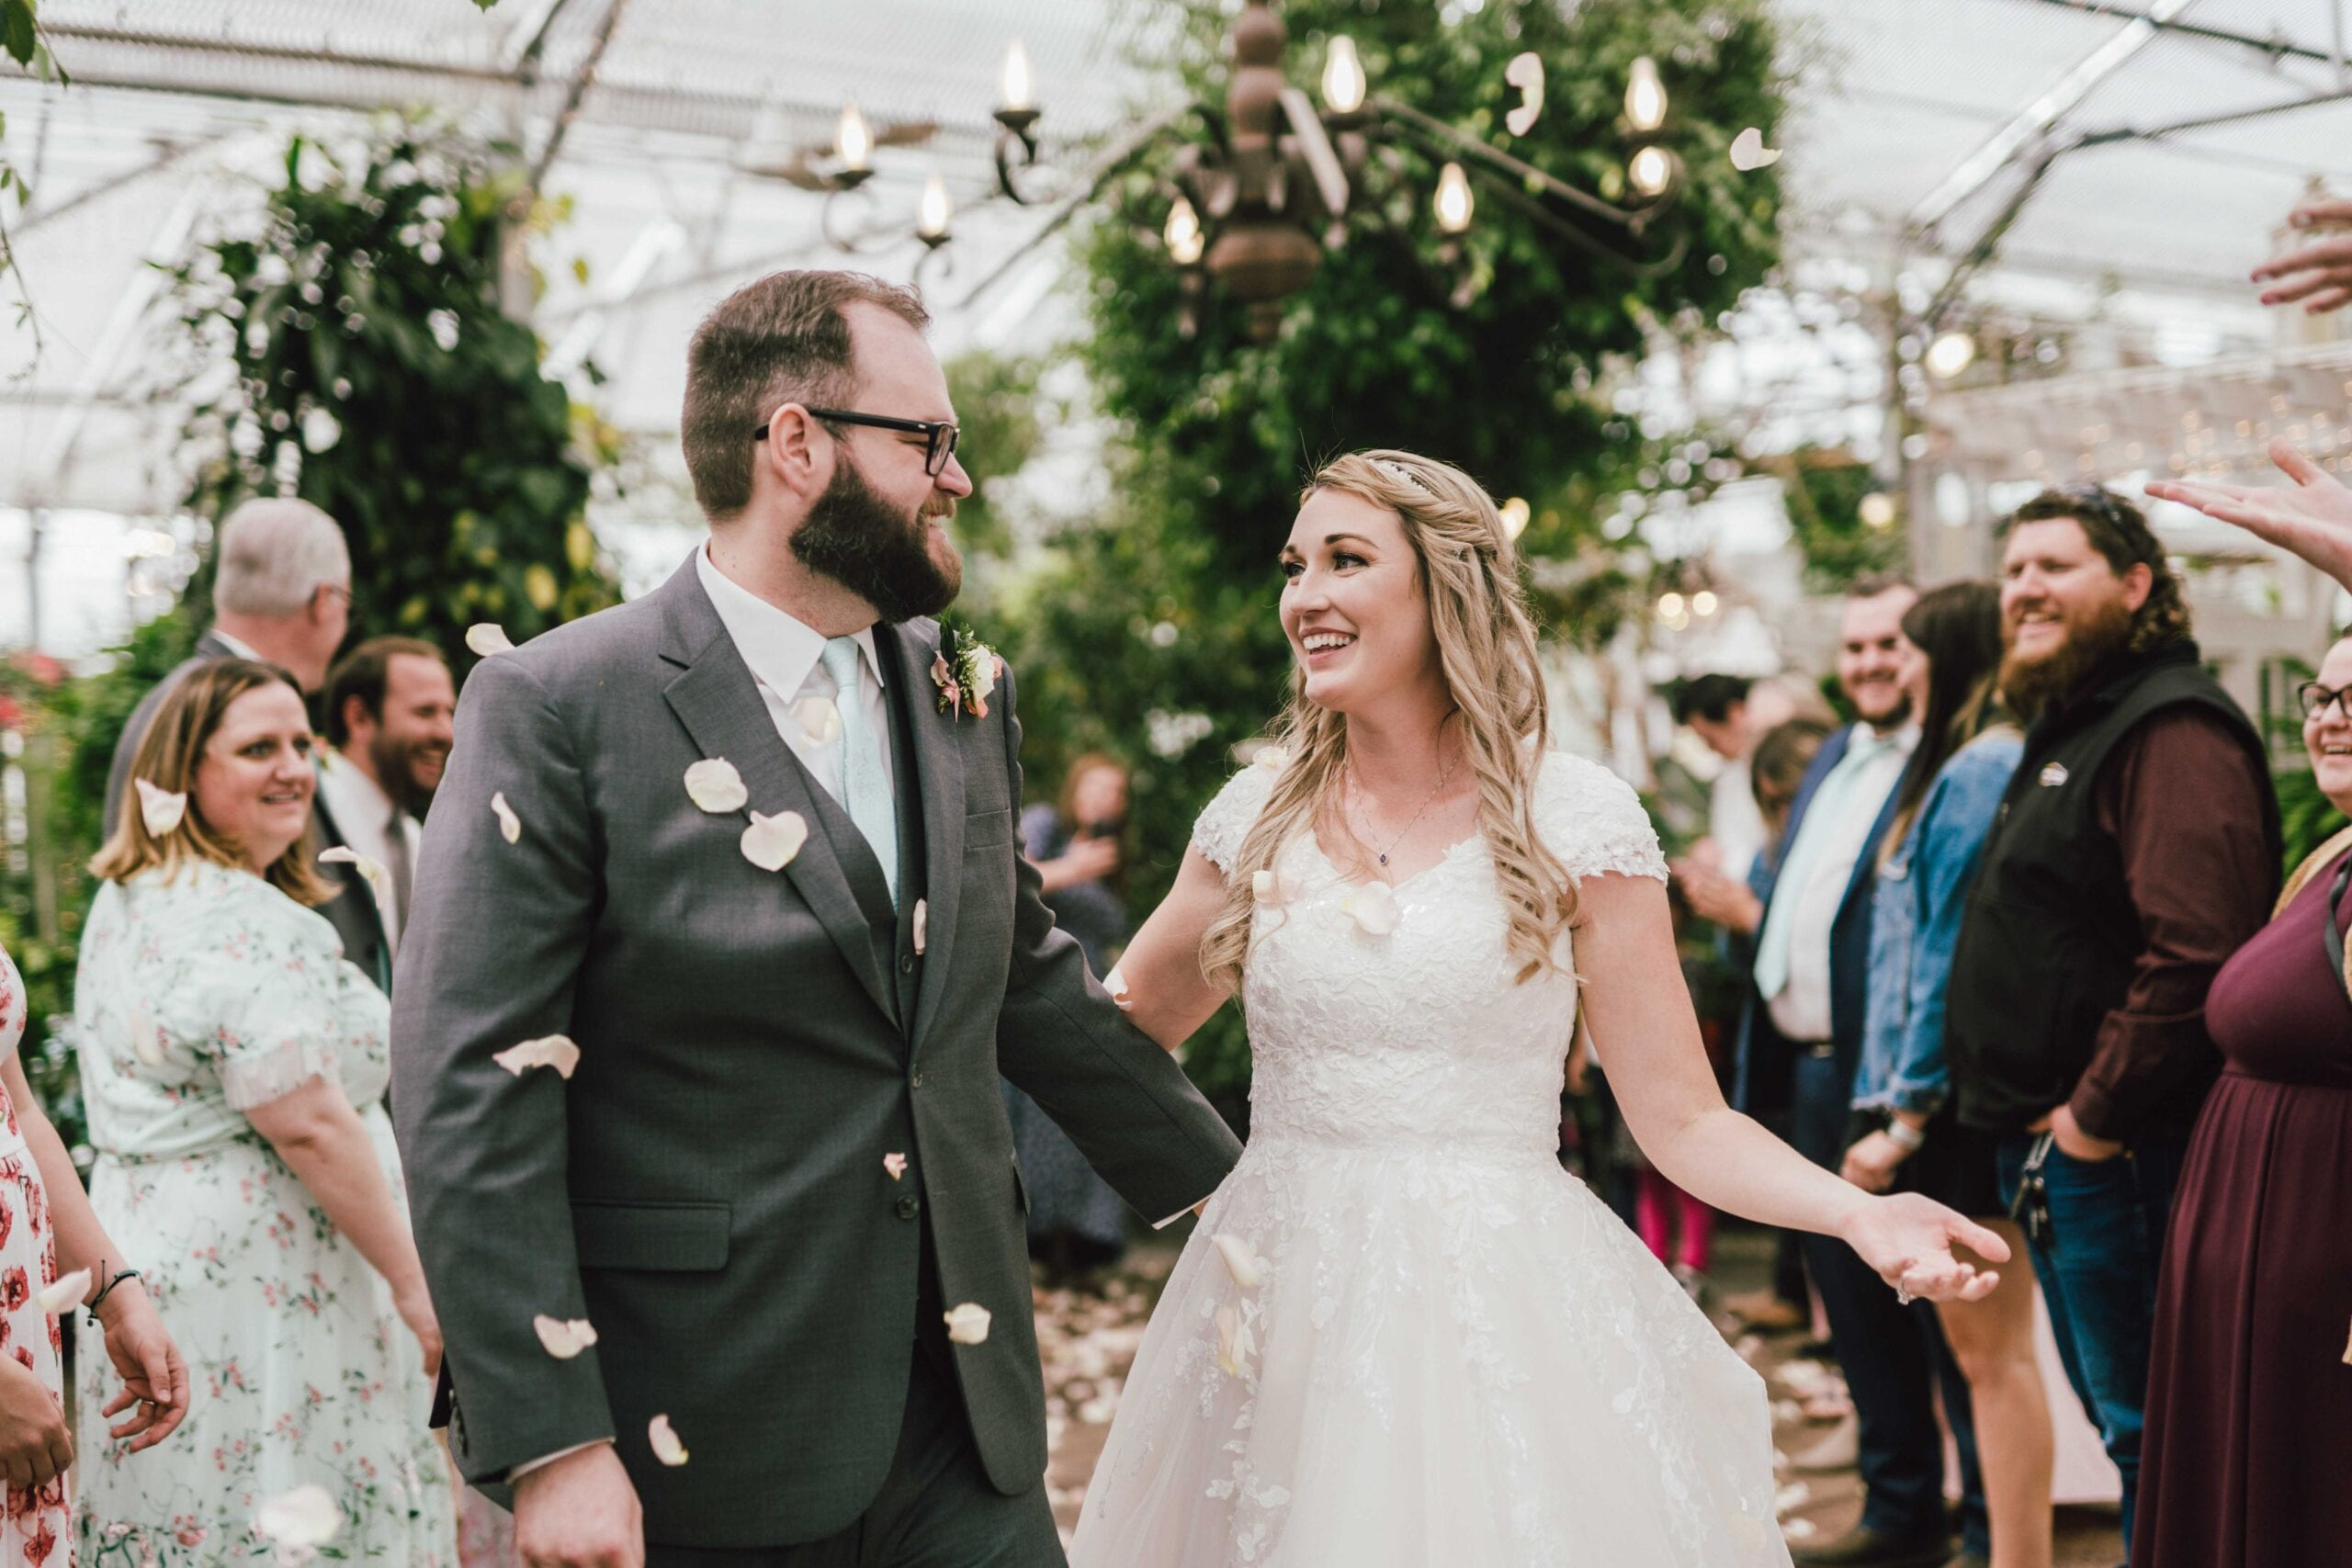 wedding reception with flower petals